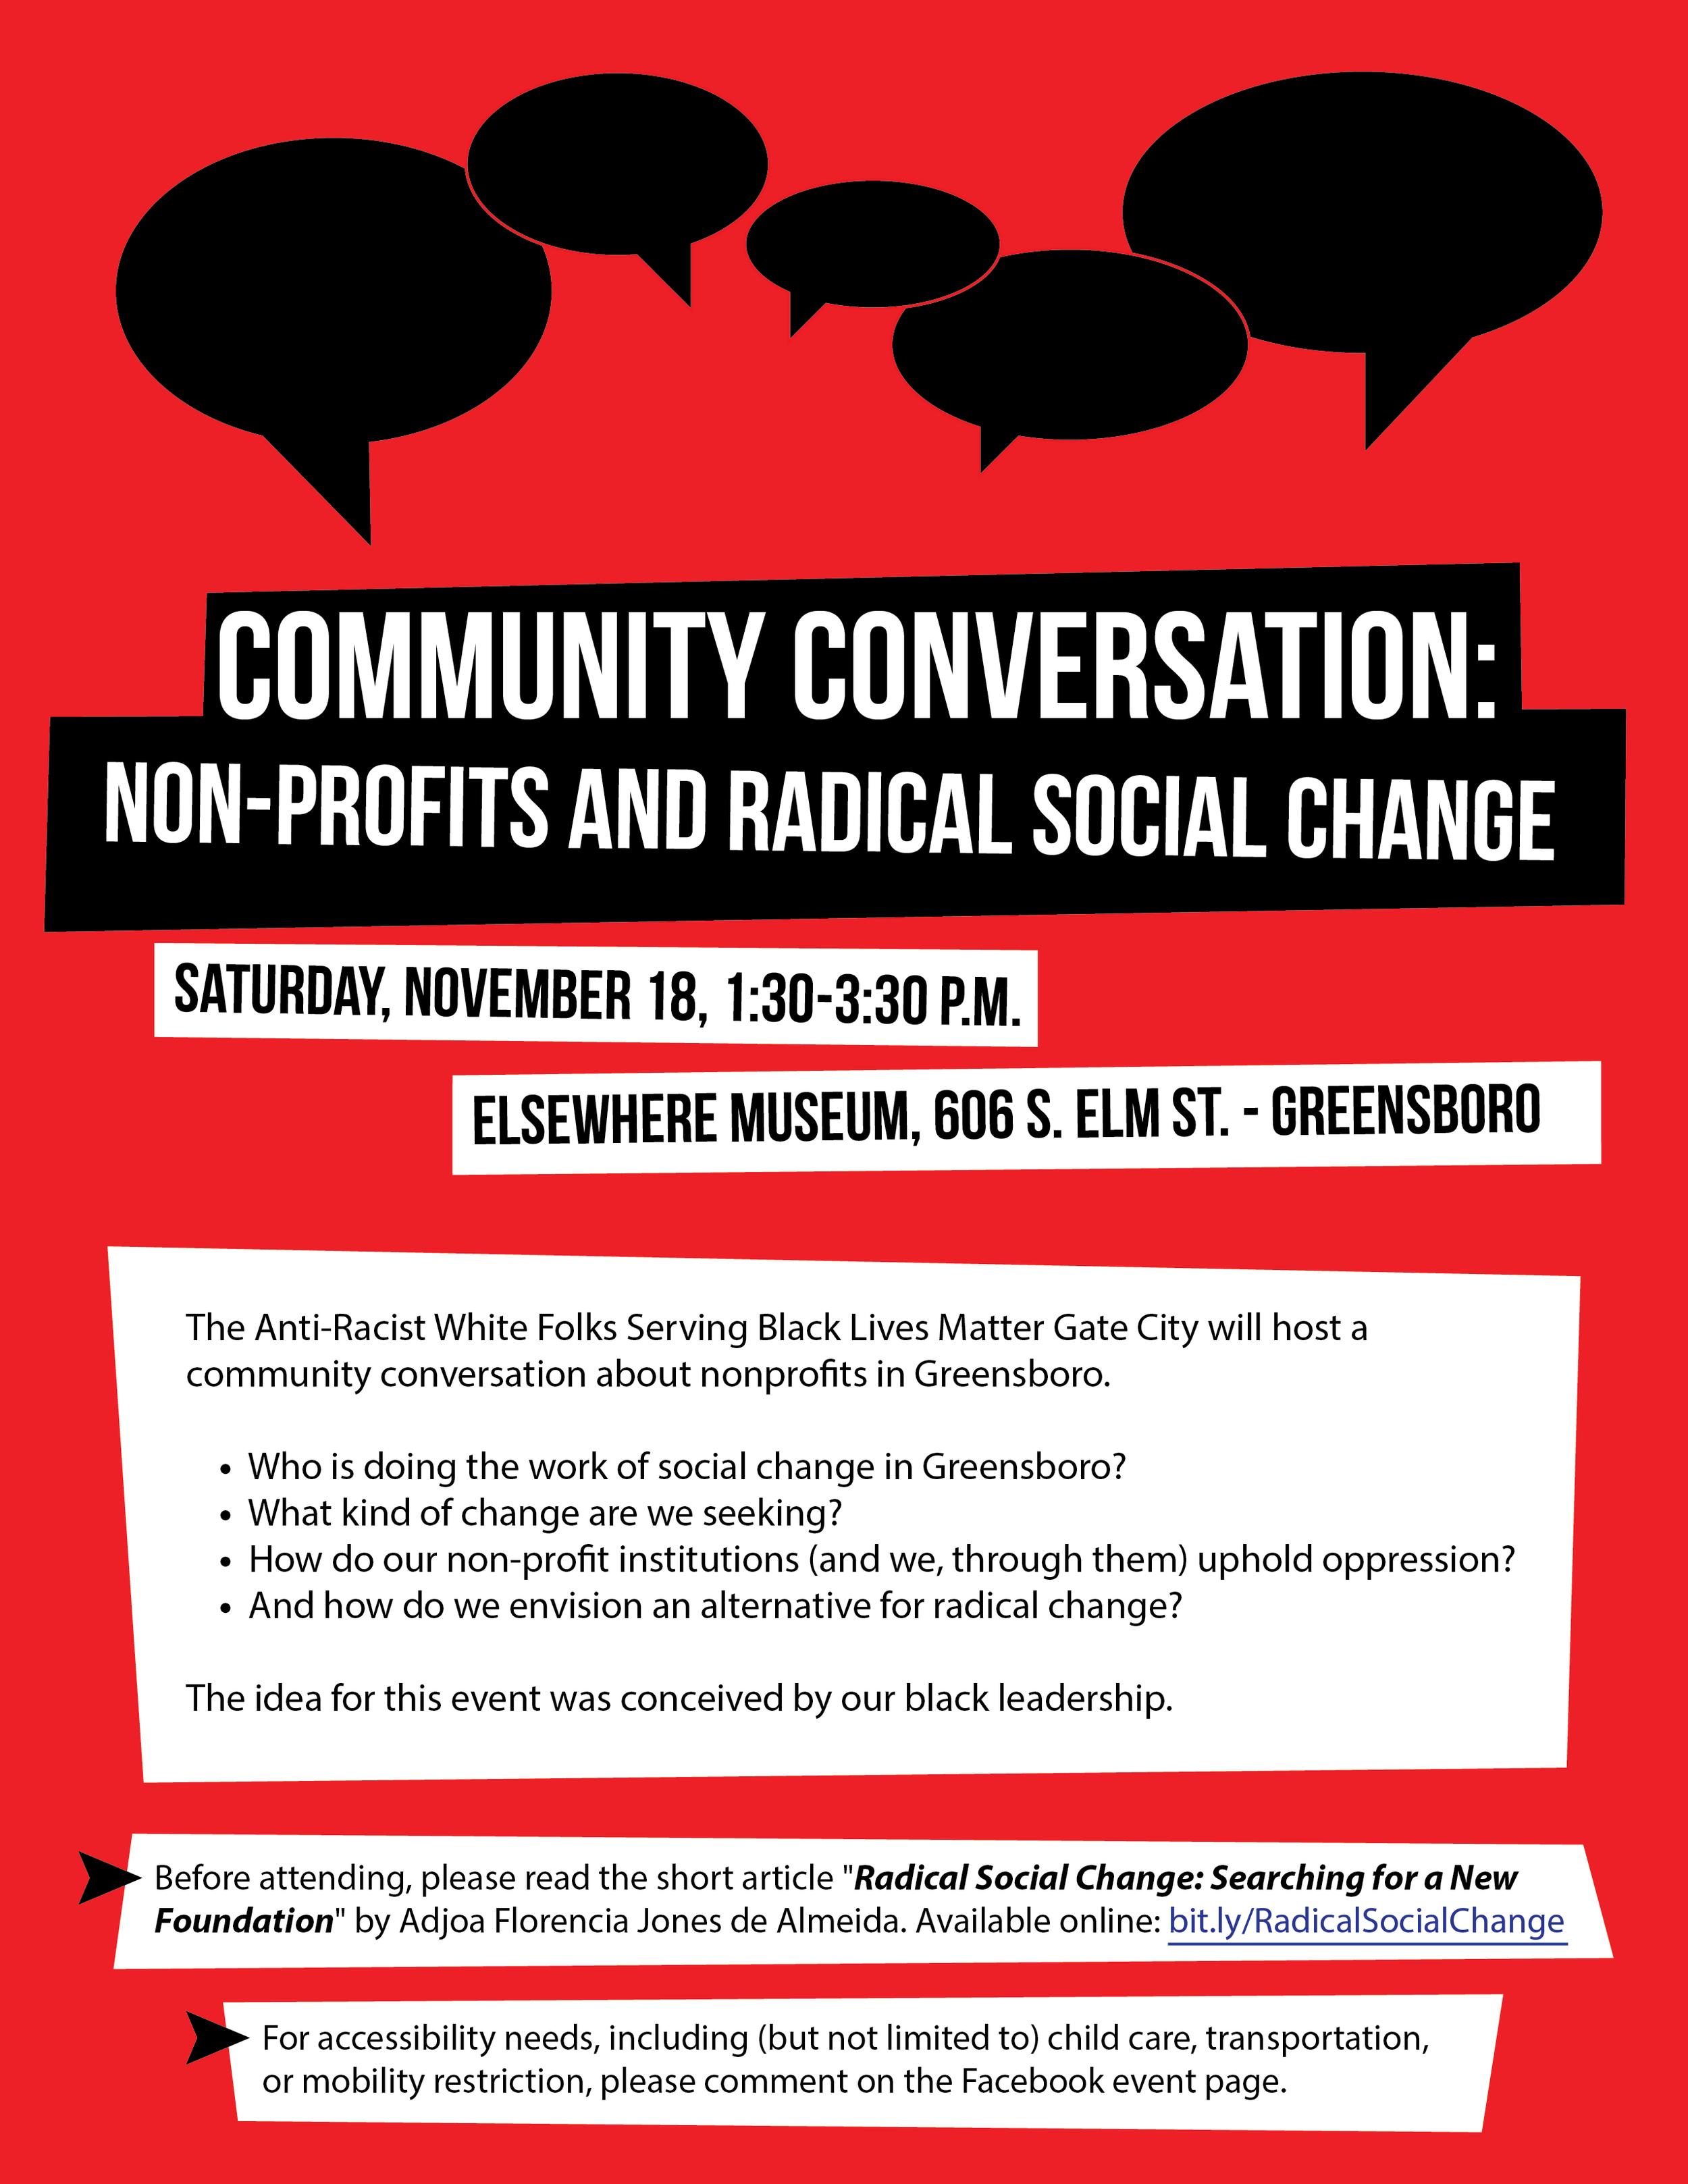 Community_Conversation-flyer-01.png